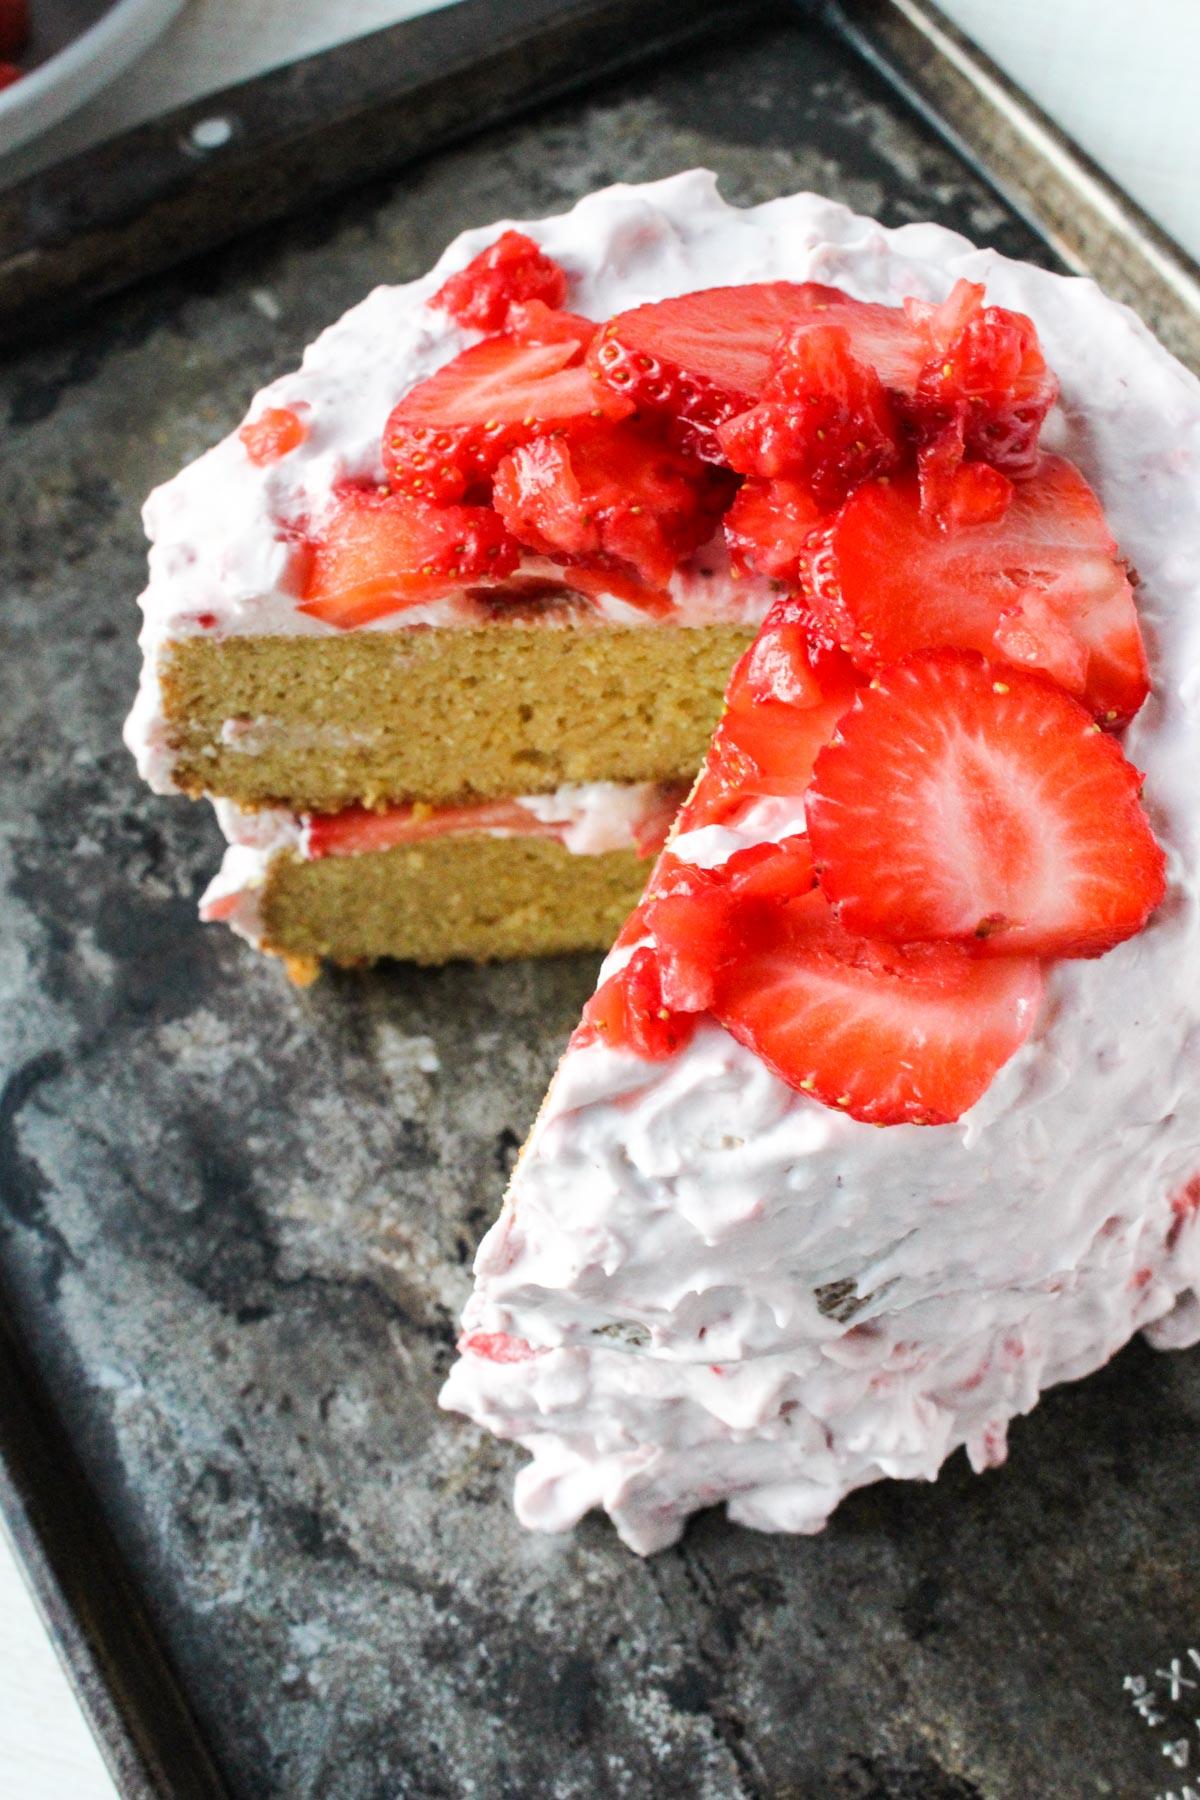 Overhead shot of gluten-free lemon cake with fresh strawberries on top.